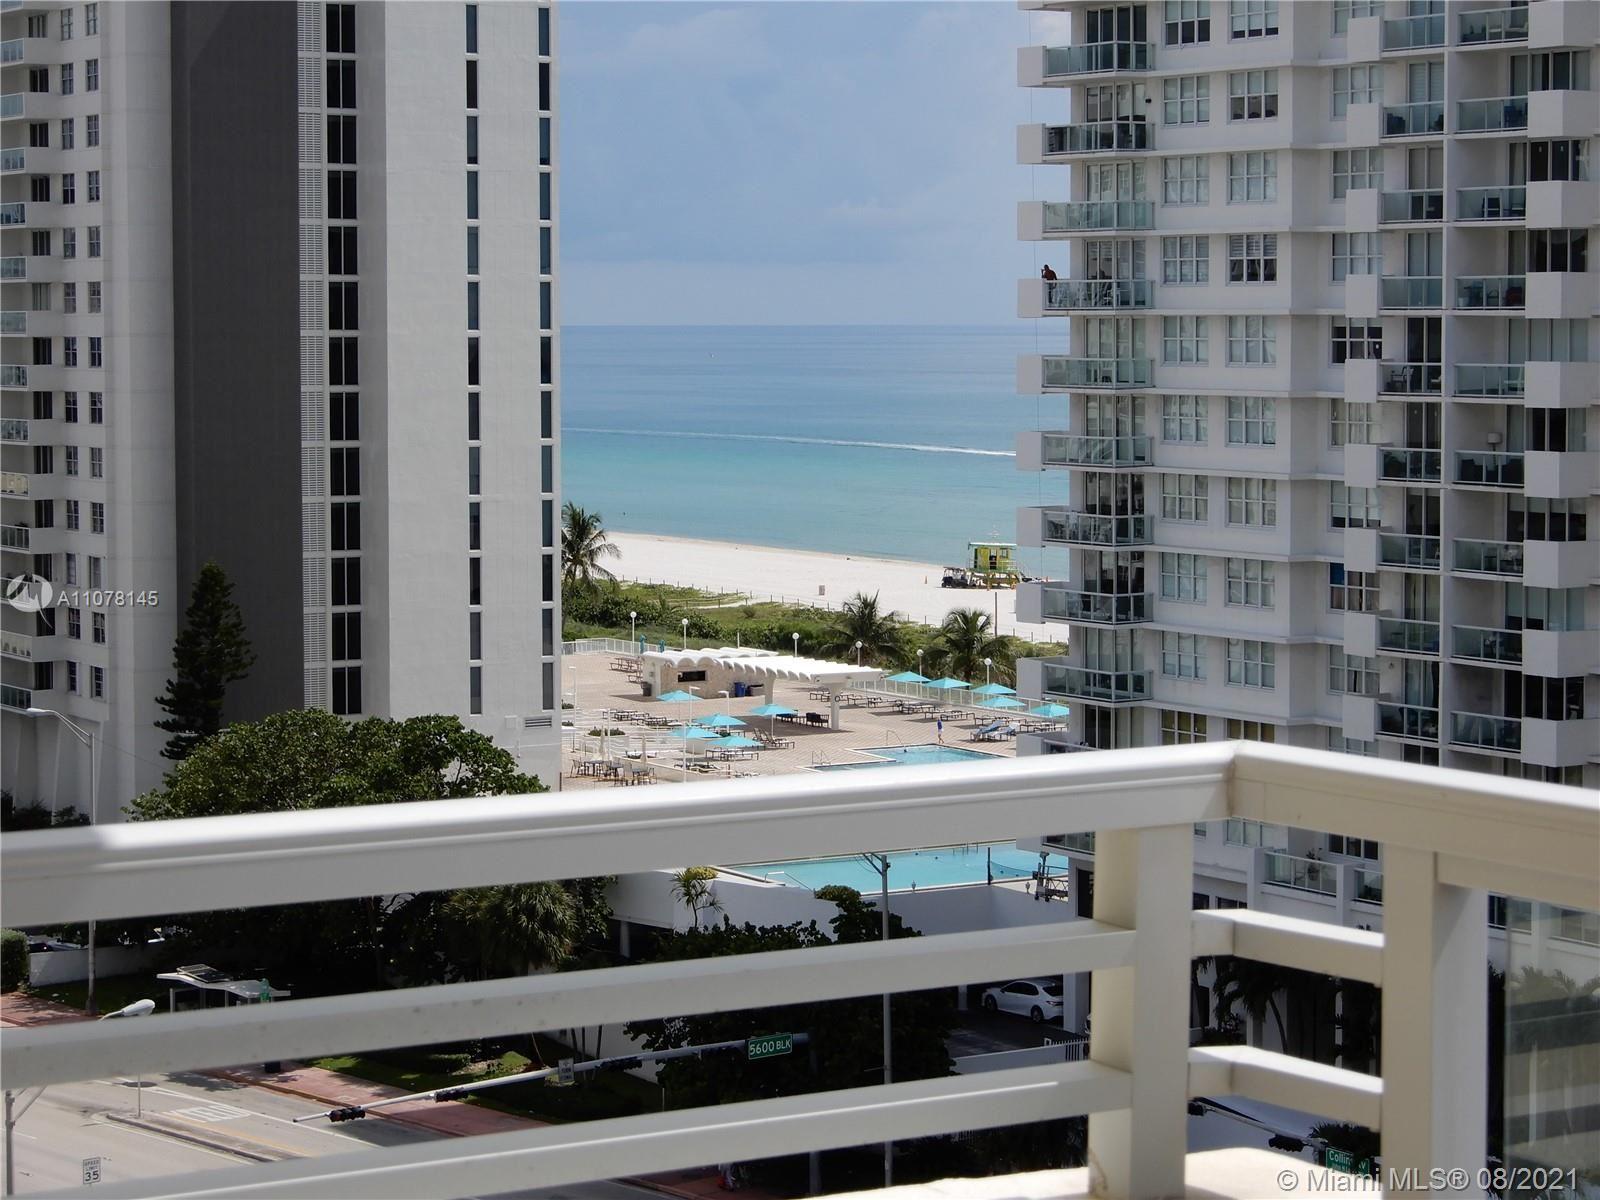 5600 Collins Ave #11V, Miami Beach, FL 33140 - #: A11078145